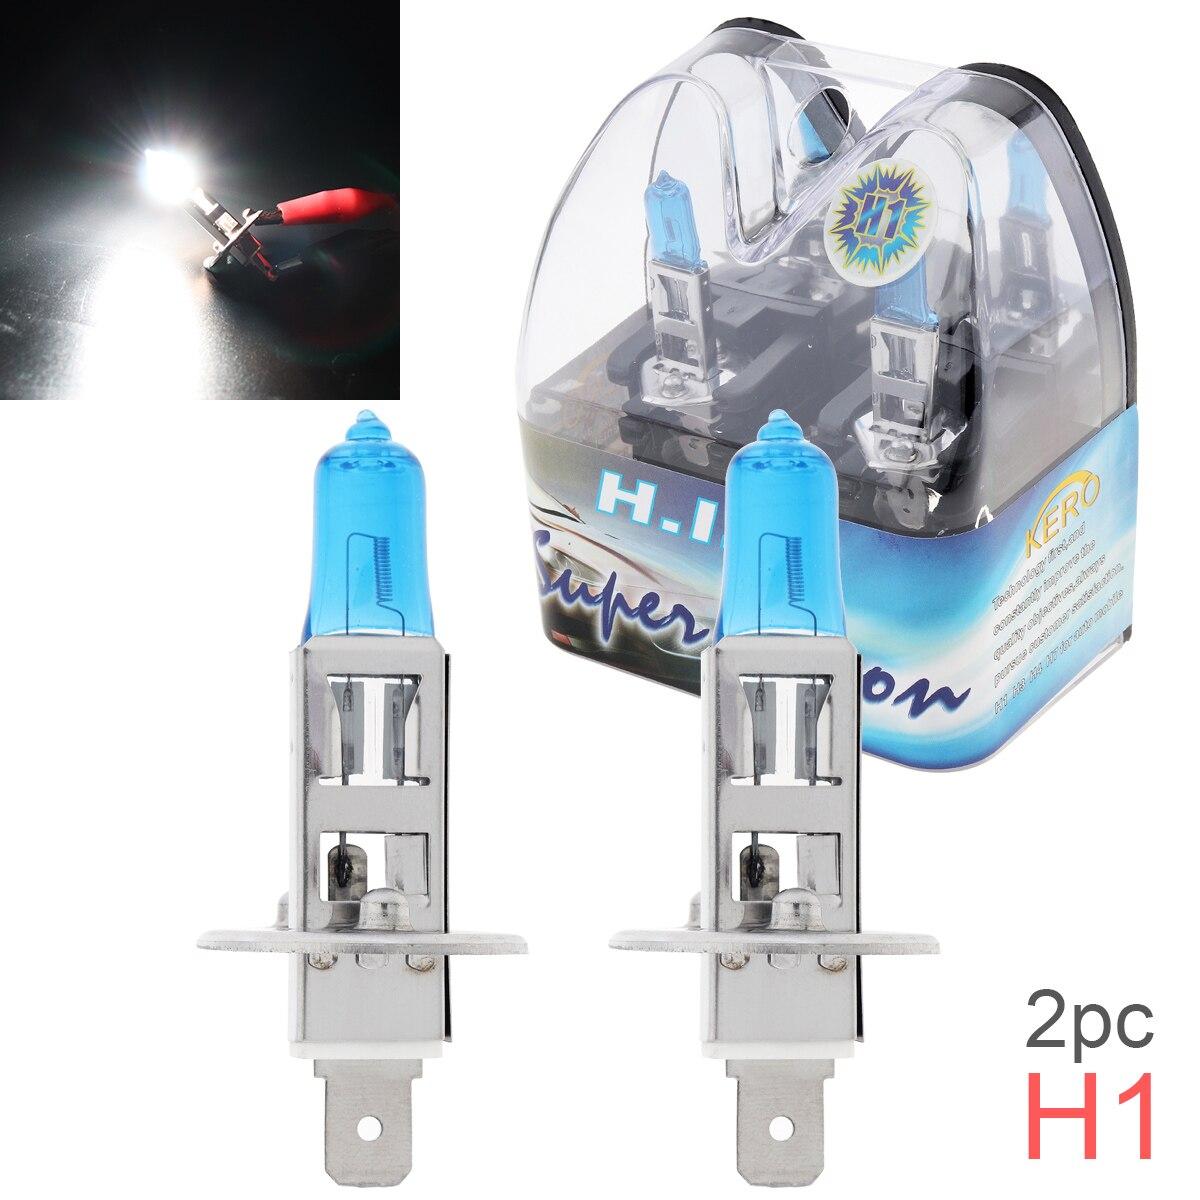 2 шт. DC 12V H1 55W 6000K белый свет супер яркий автомобиль один ксенон галогенная лампа авто передняя фара противотуманная лампа для наружных фар